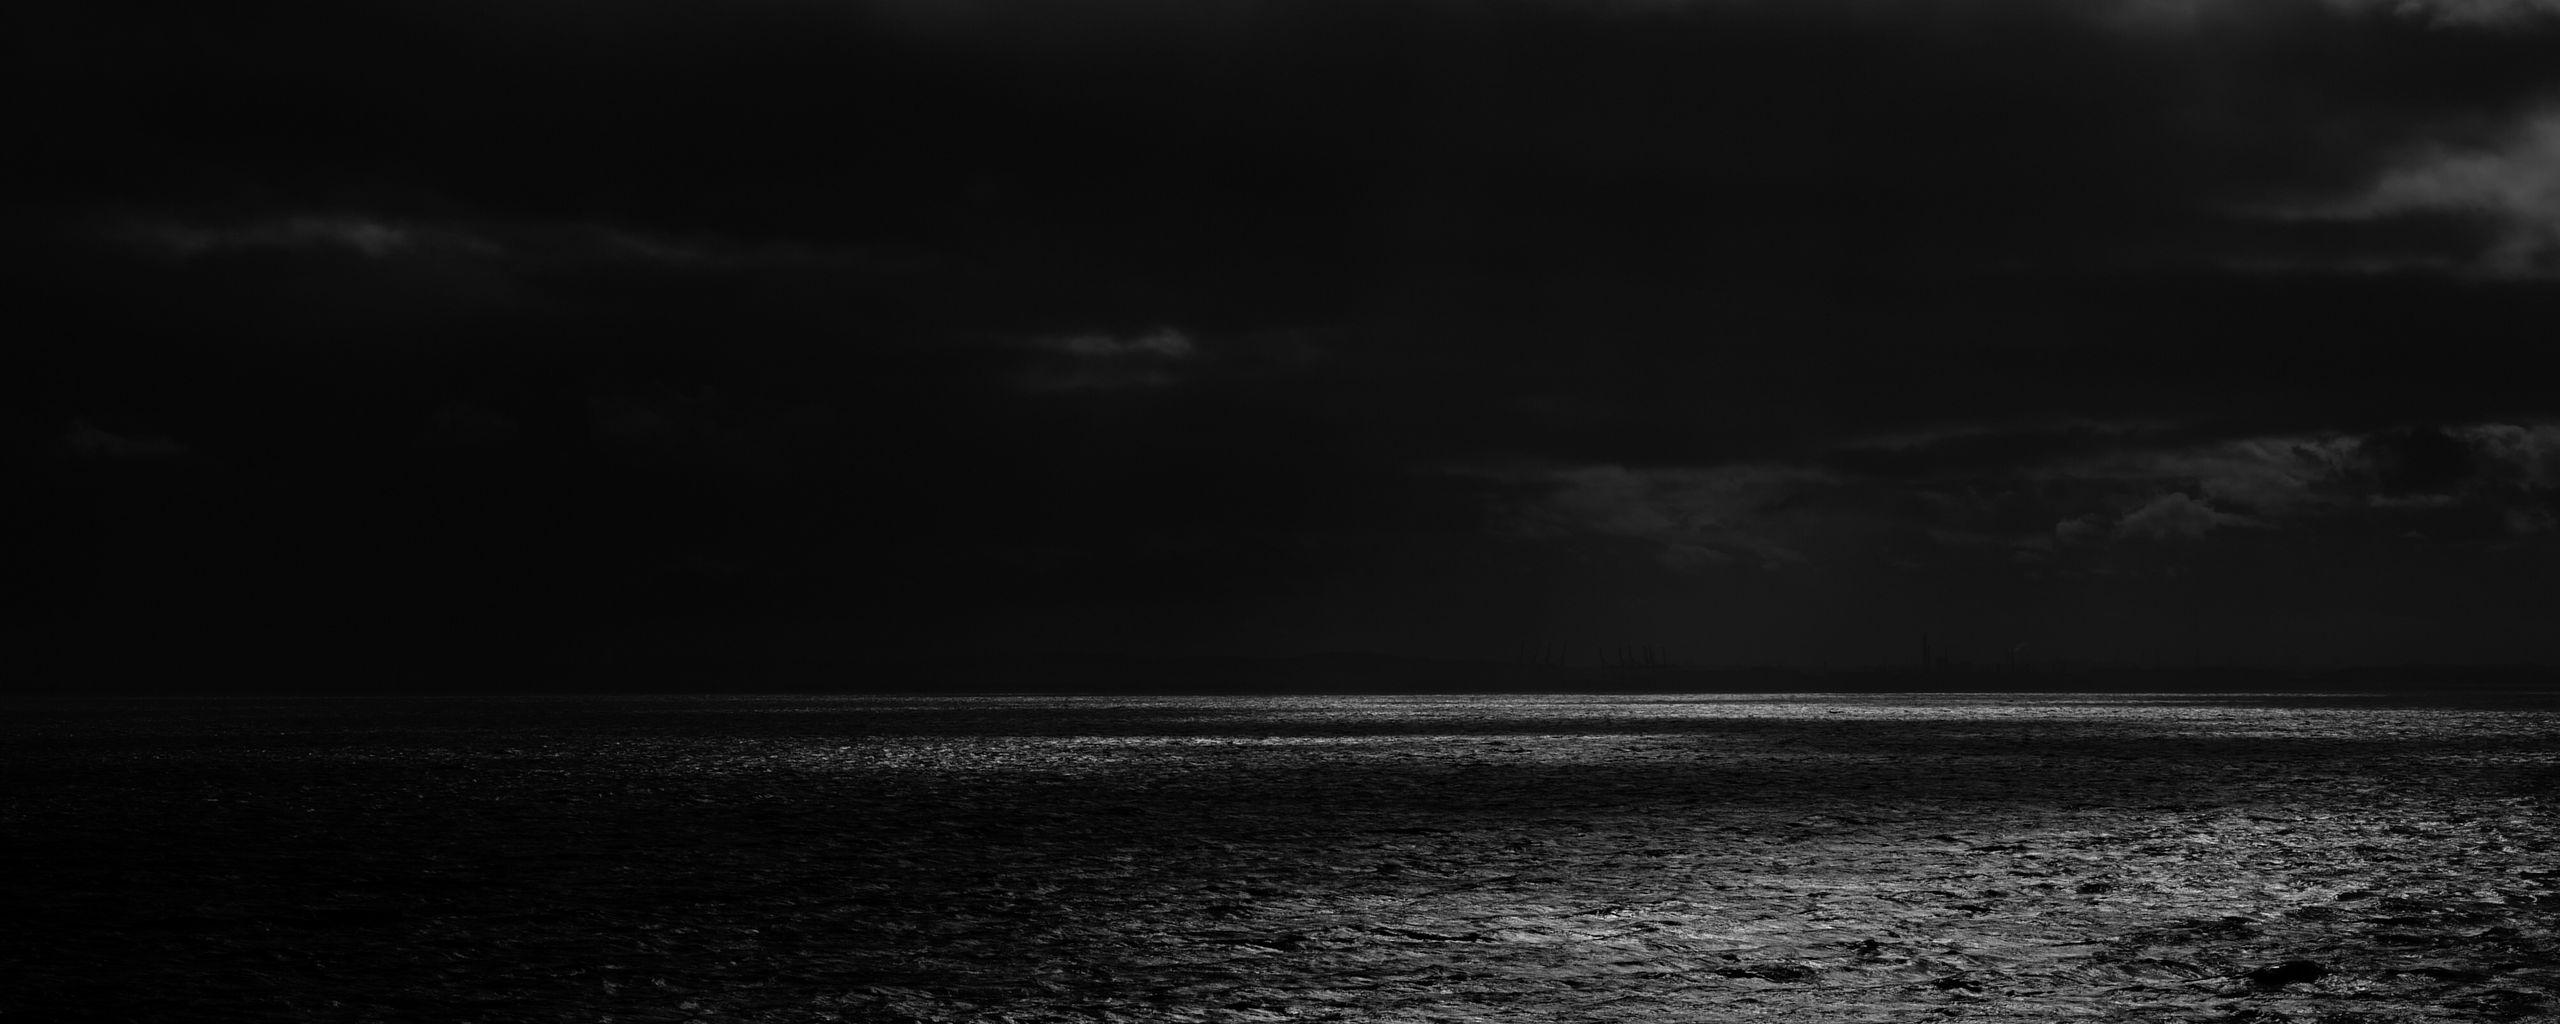 2560x1024 Wallpaper sea, horizon, bw, overcast, clouds, ripples